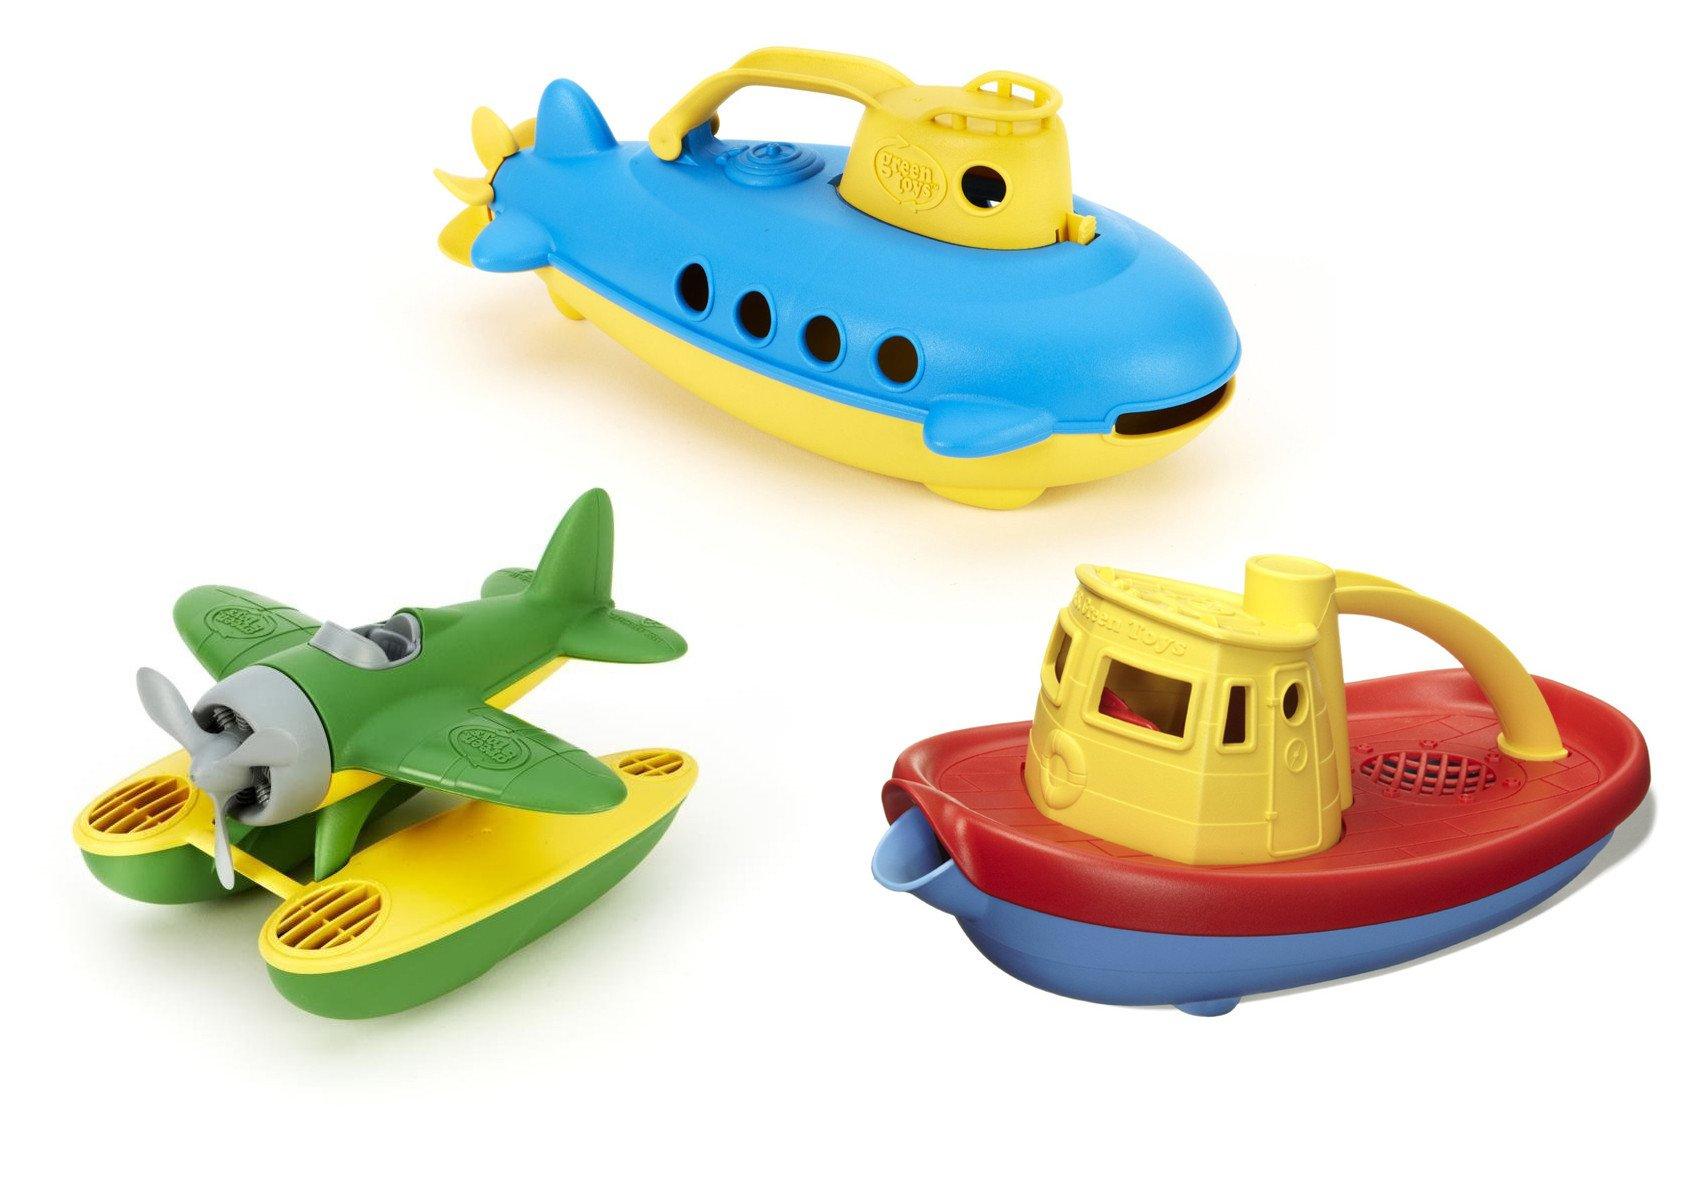 Green Toys Submarine, Seaplane & Tug Boat Bath Toy Bundle